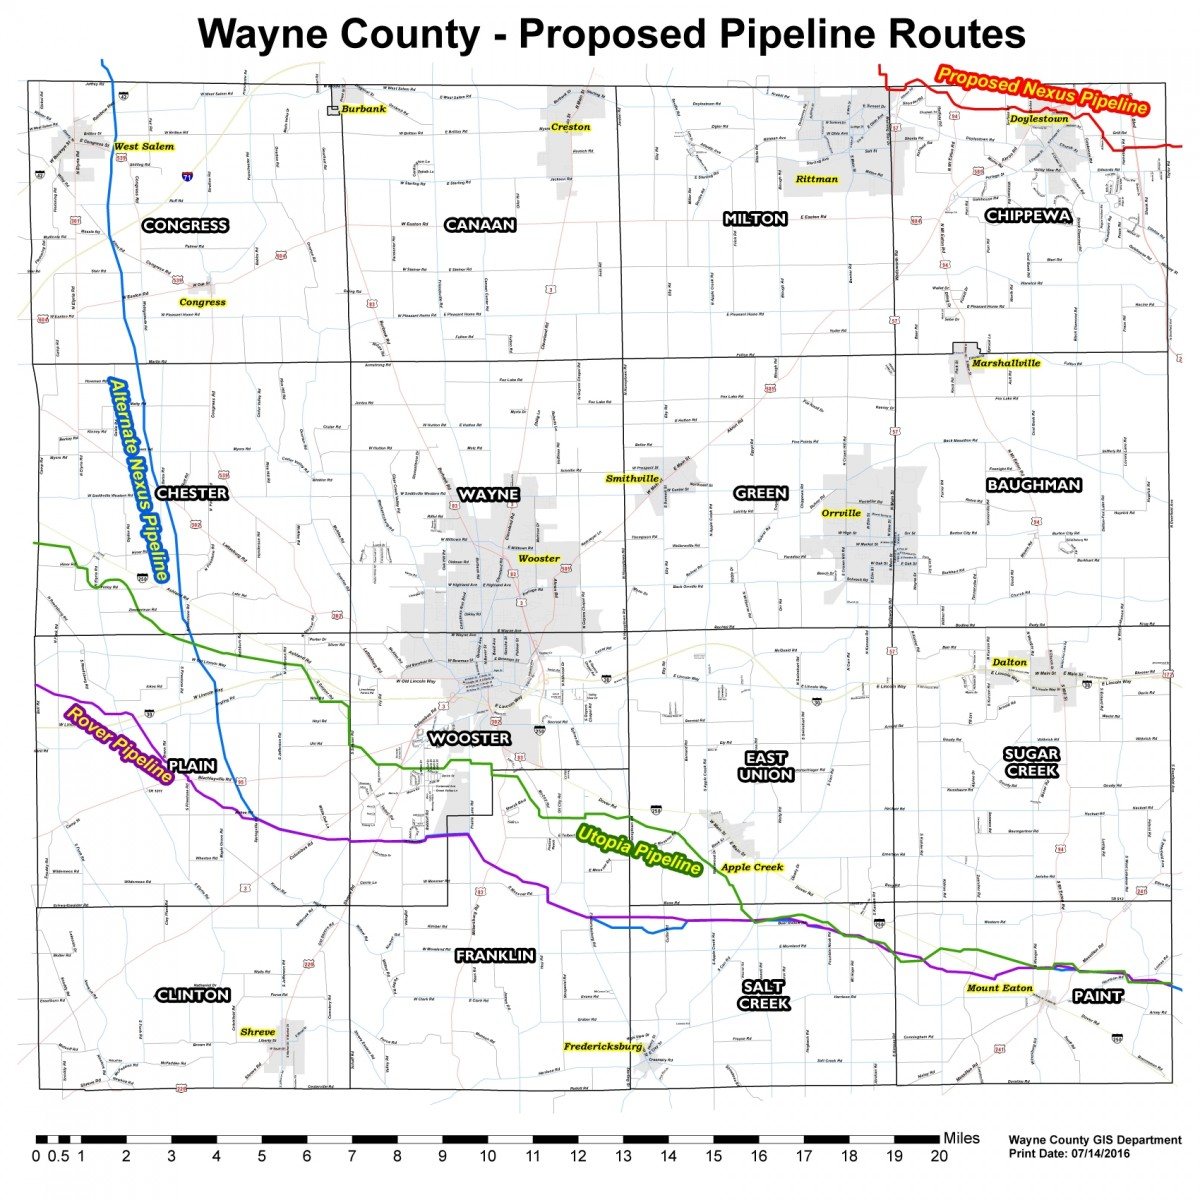 NEXUS Information | Wayne County Ohio on